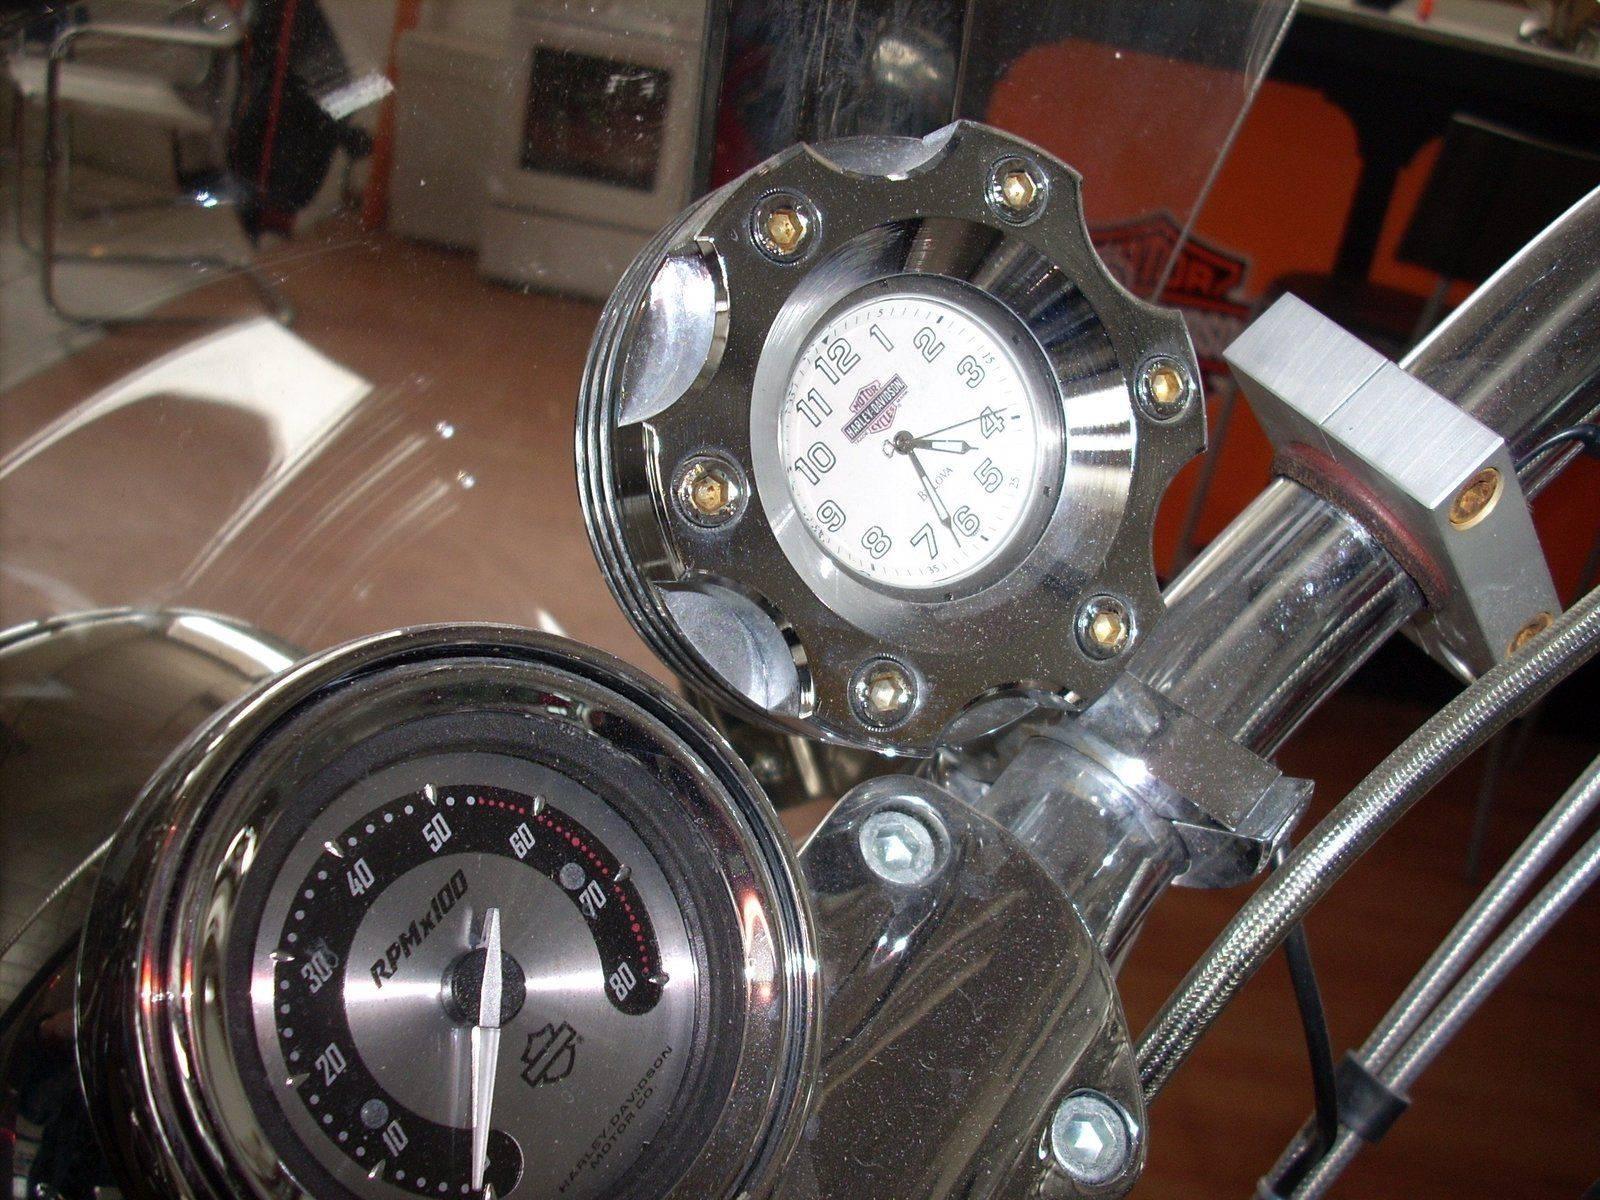 Montre Harley 002.JPG